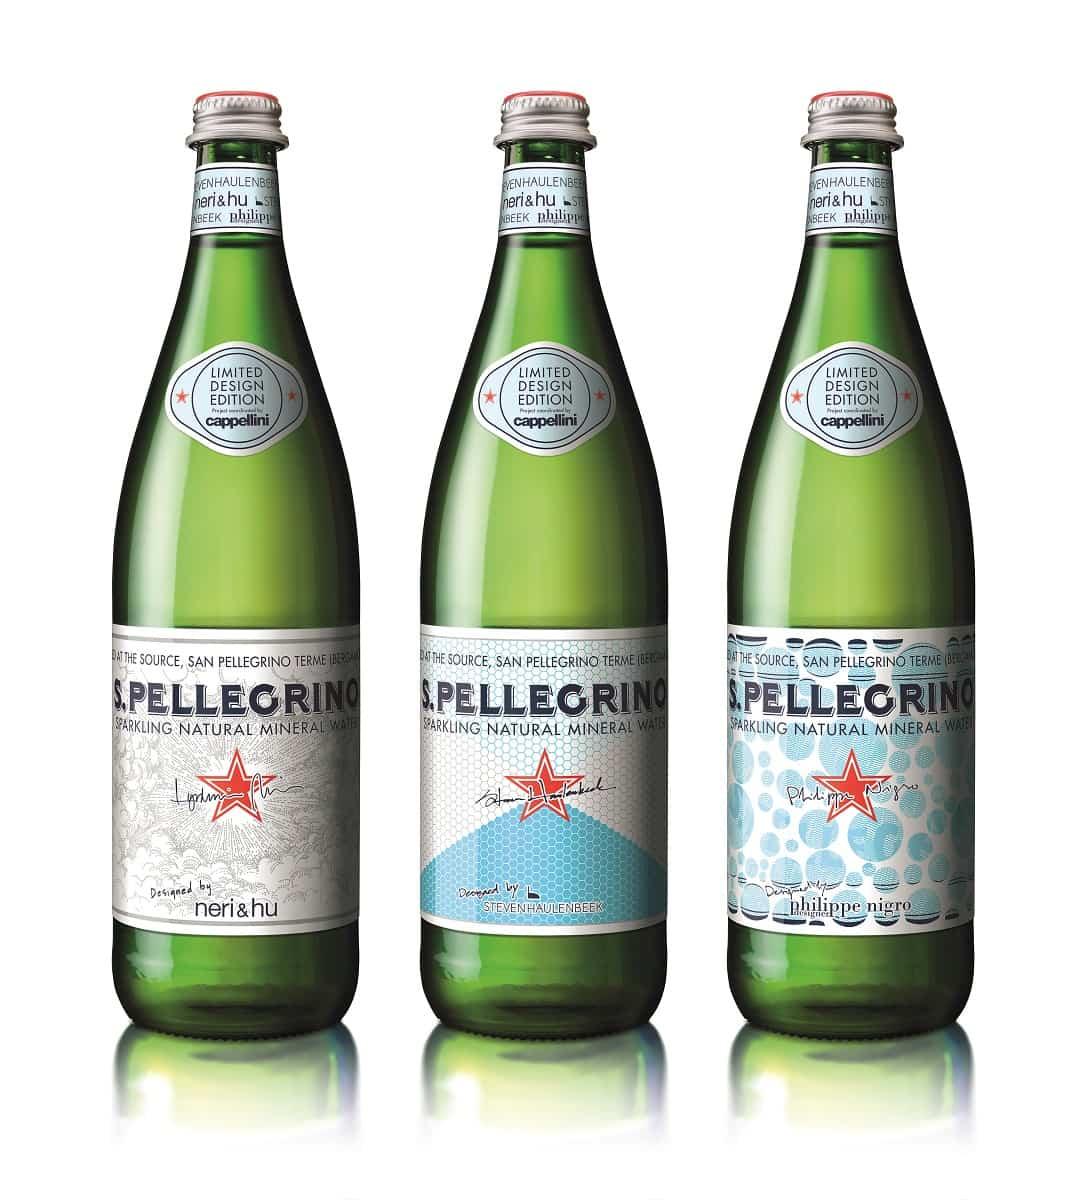 s. pellegrino special design edition bottles